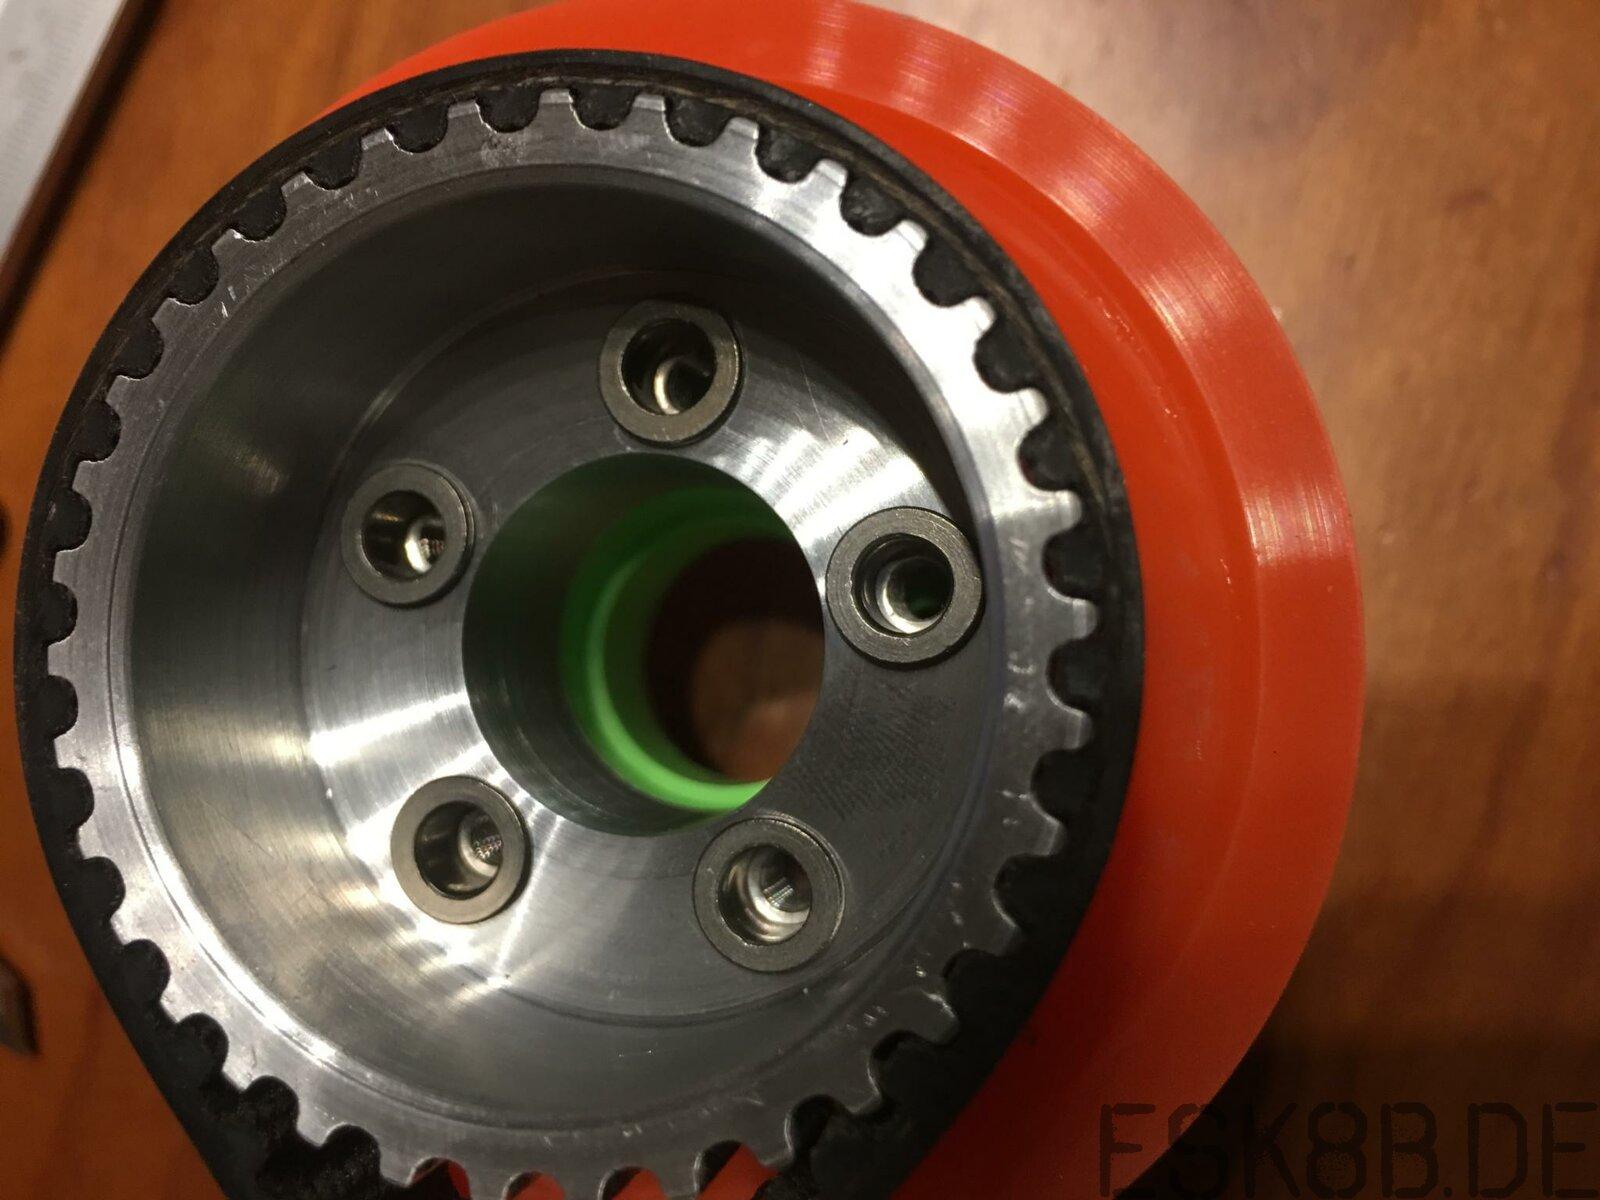 Kegel Wheel Pulley ausgedreht   59g leichter :-))